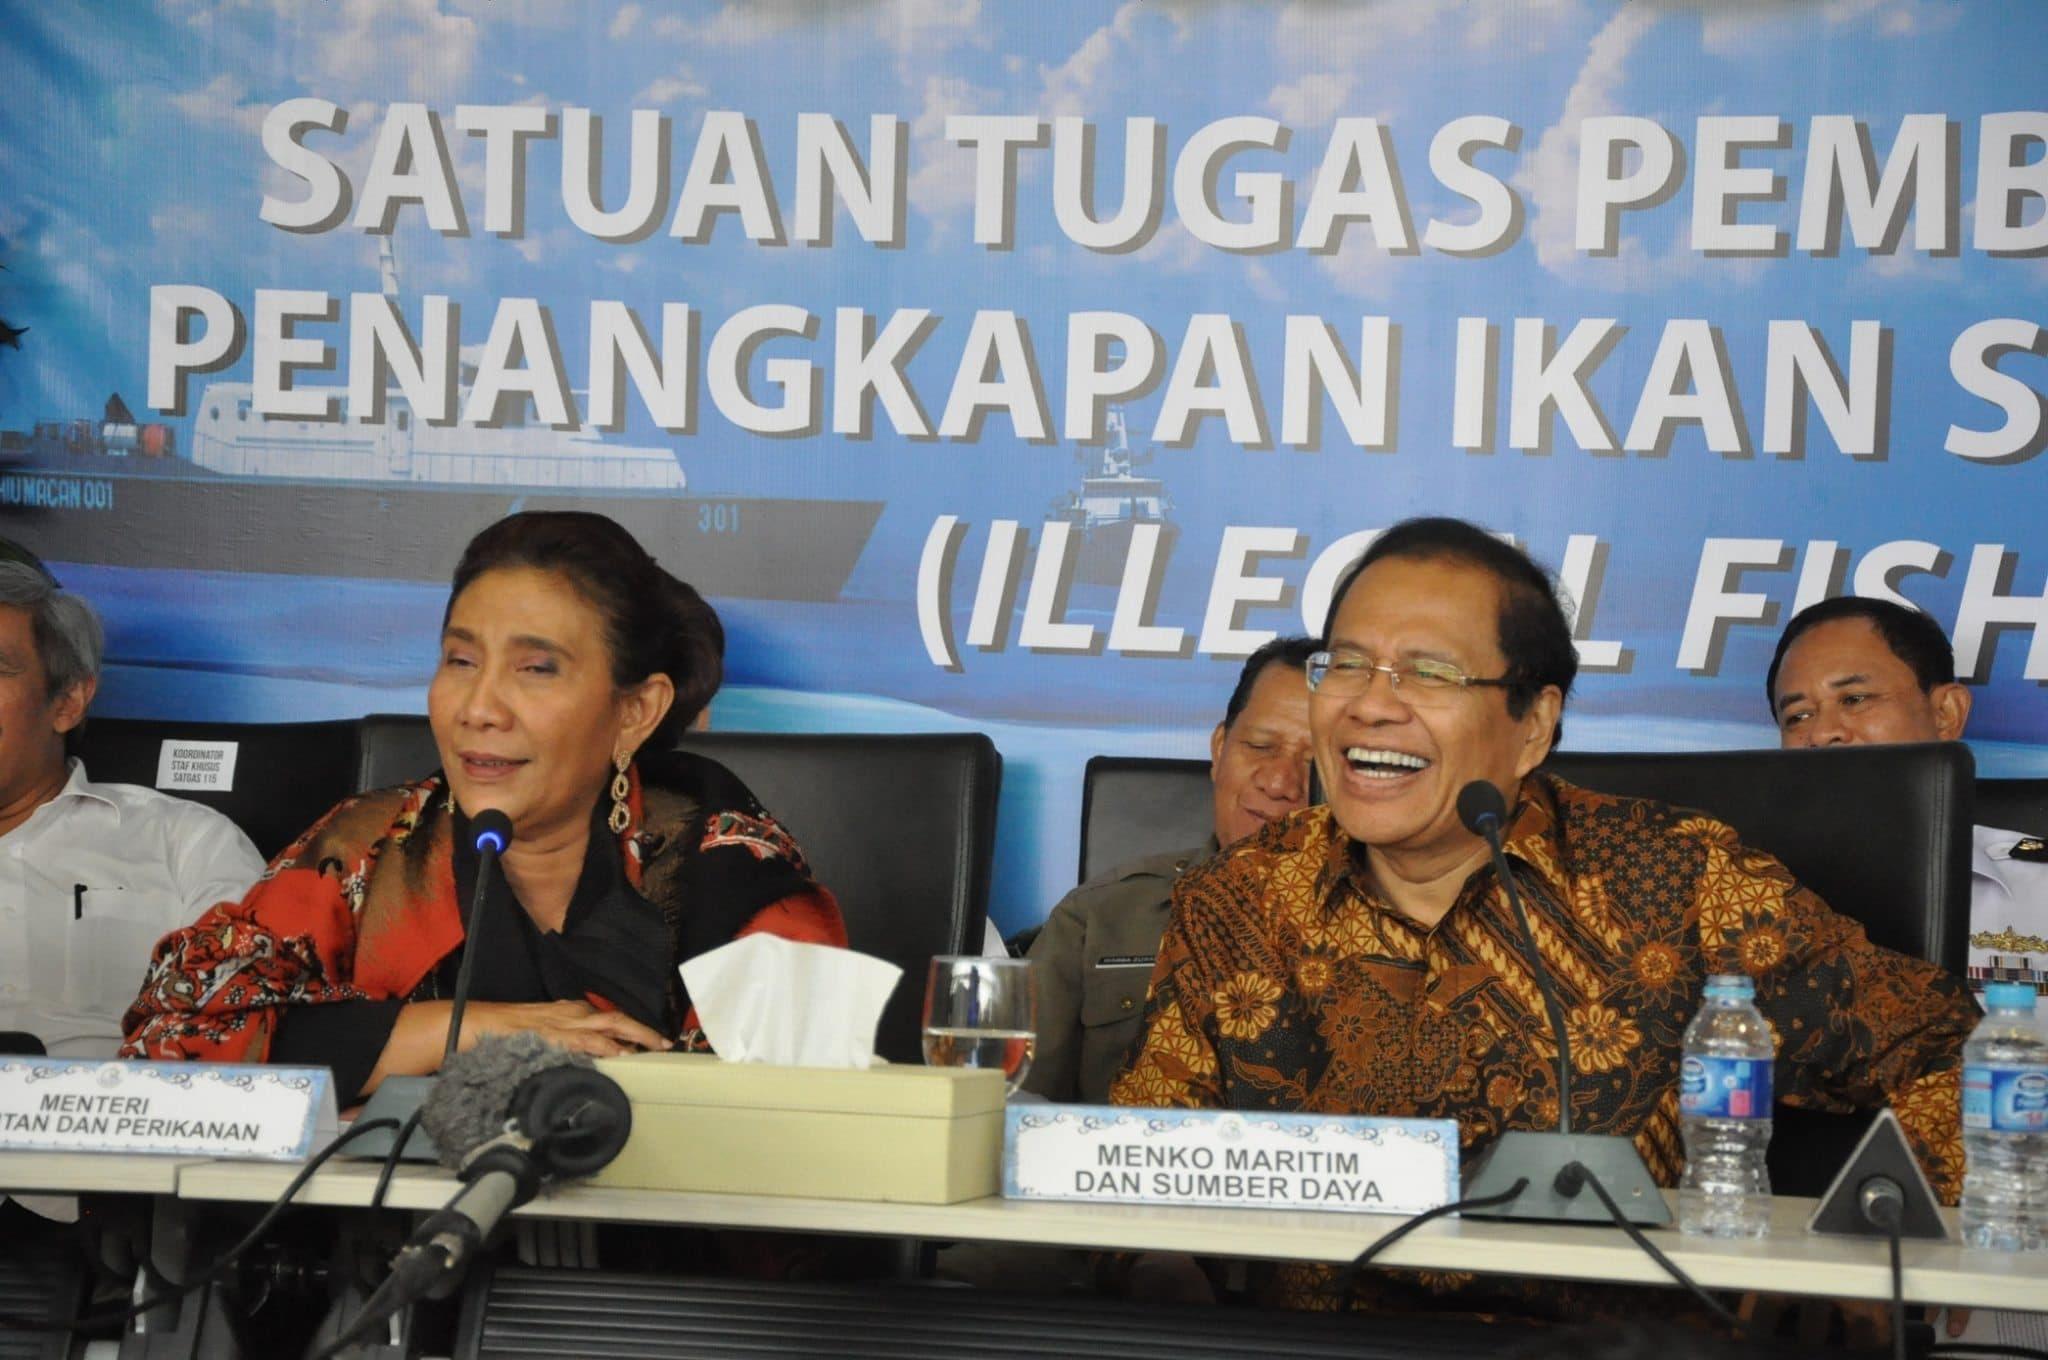 Menko Rizal Pantau Peledakan Kapal Bersama Menteri Susi